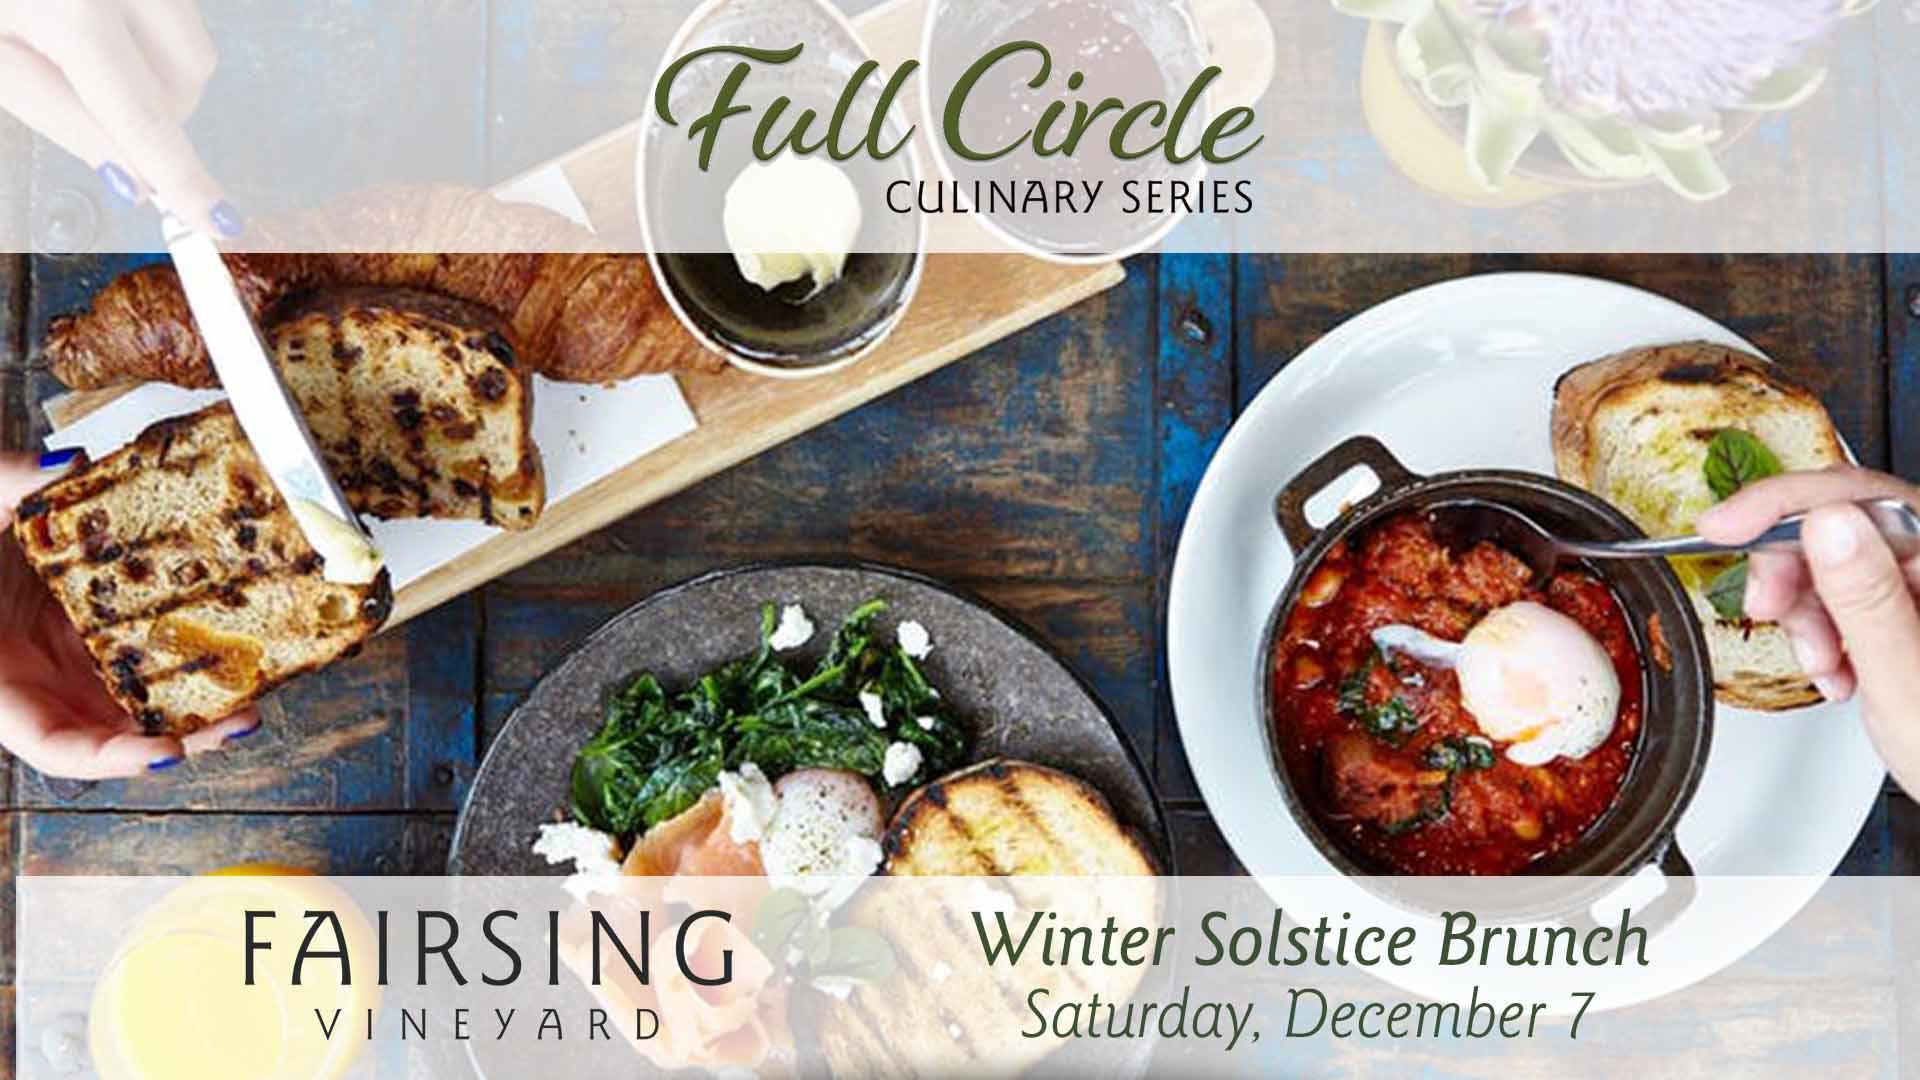 Winter Solstice Brunch @ Fairsing Vineyard